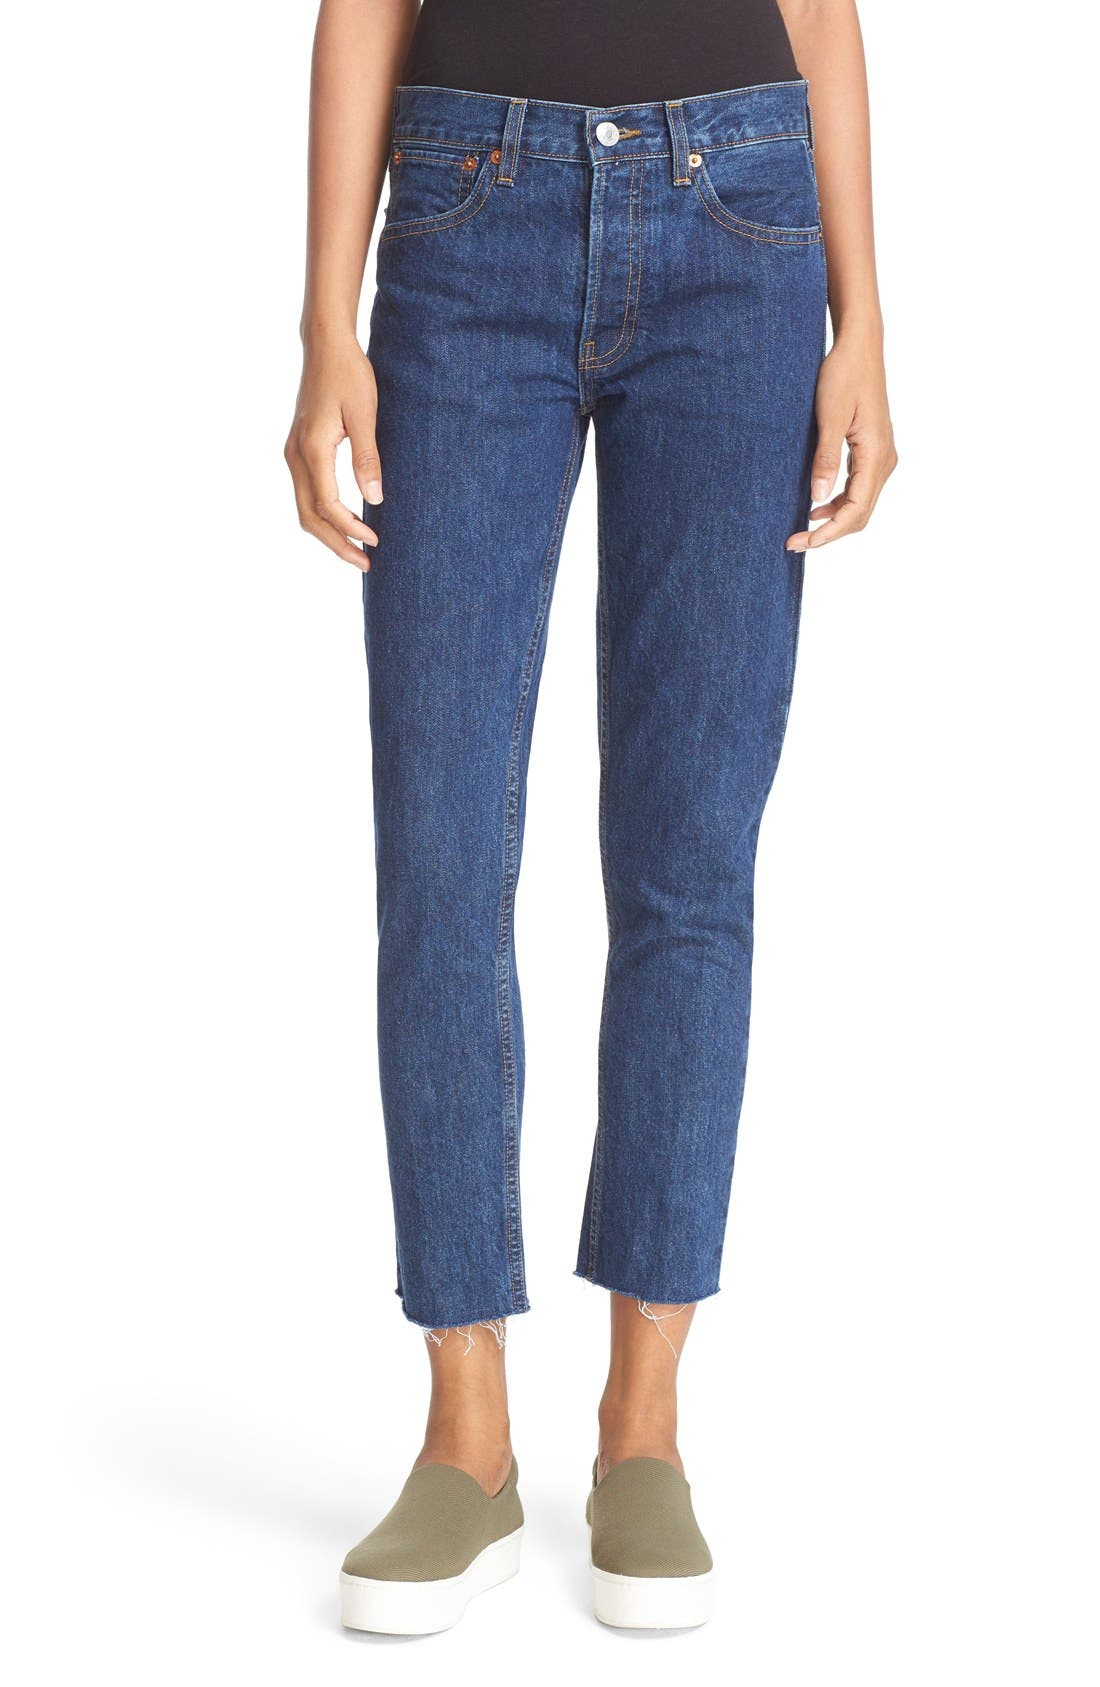 Originals High Waist Crop Jeans,                             Main thumbnail 1, color,                             400